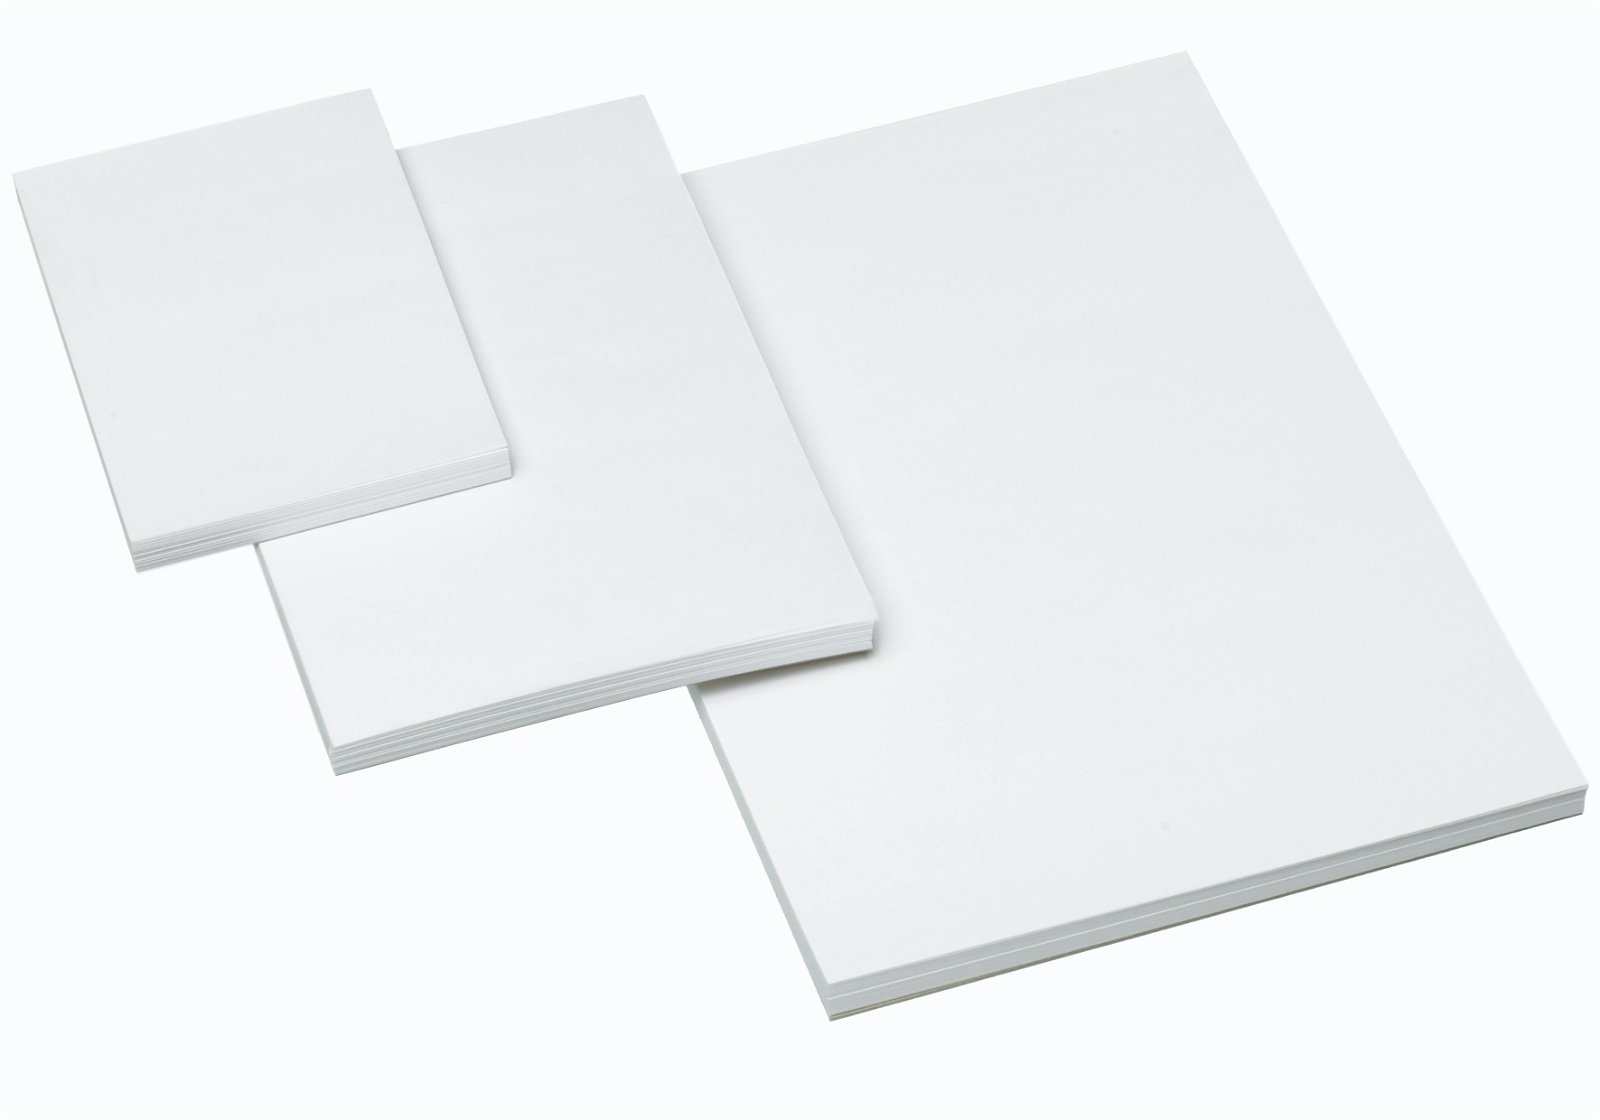 Bantex toplimet standardblok  100 sider 60 g